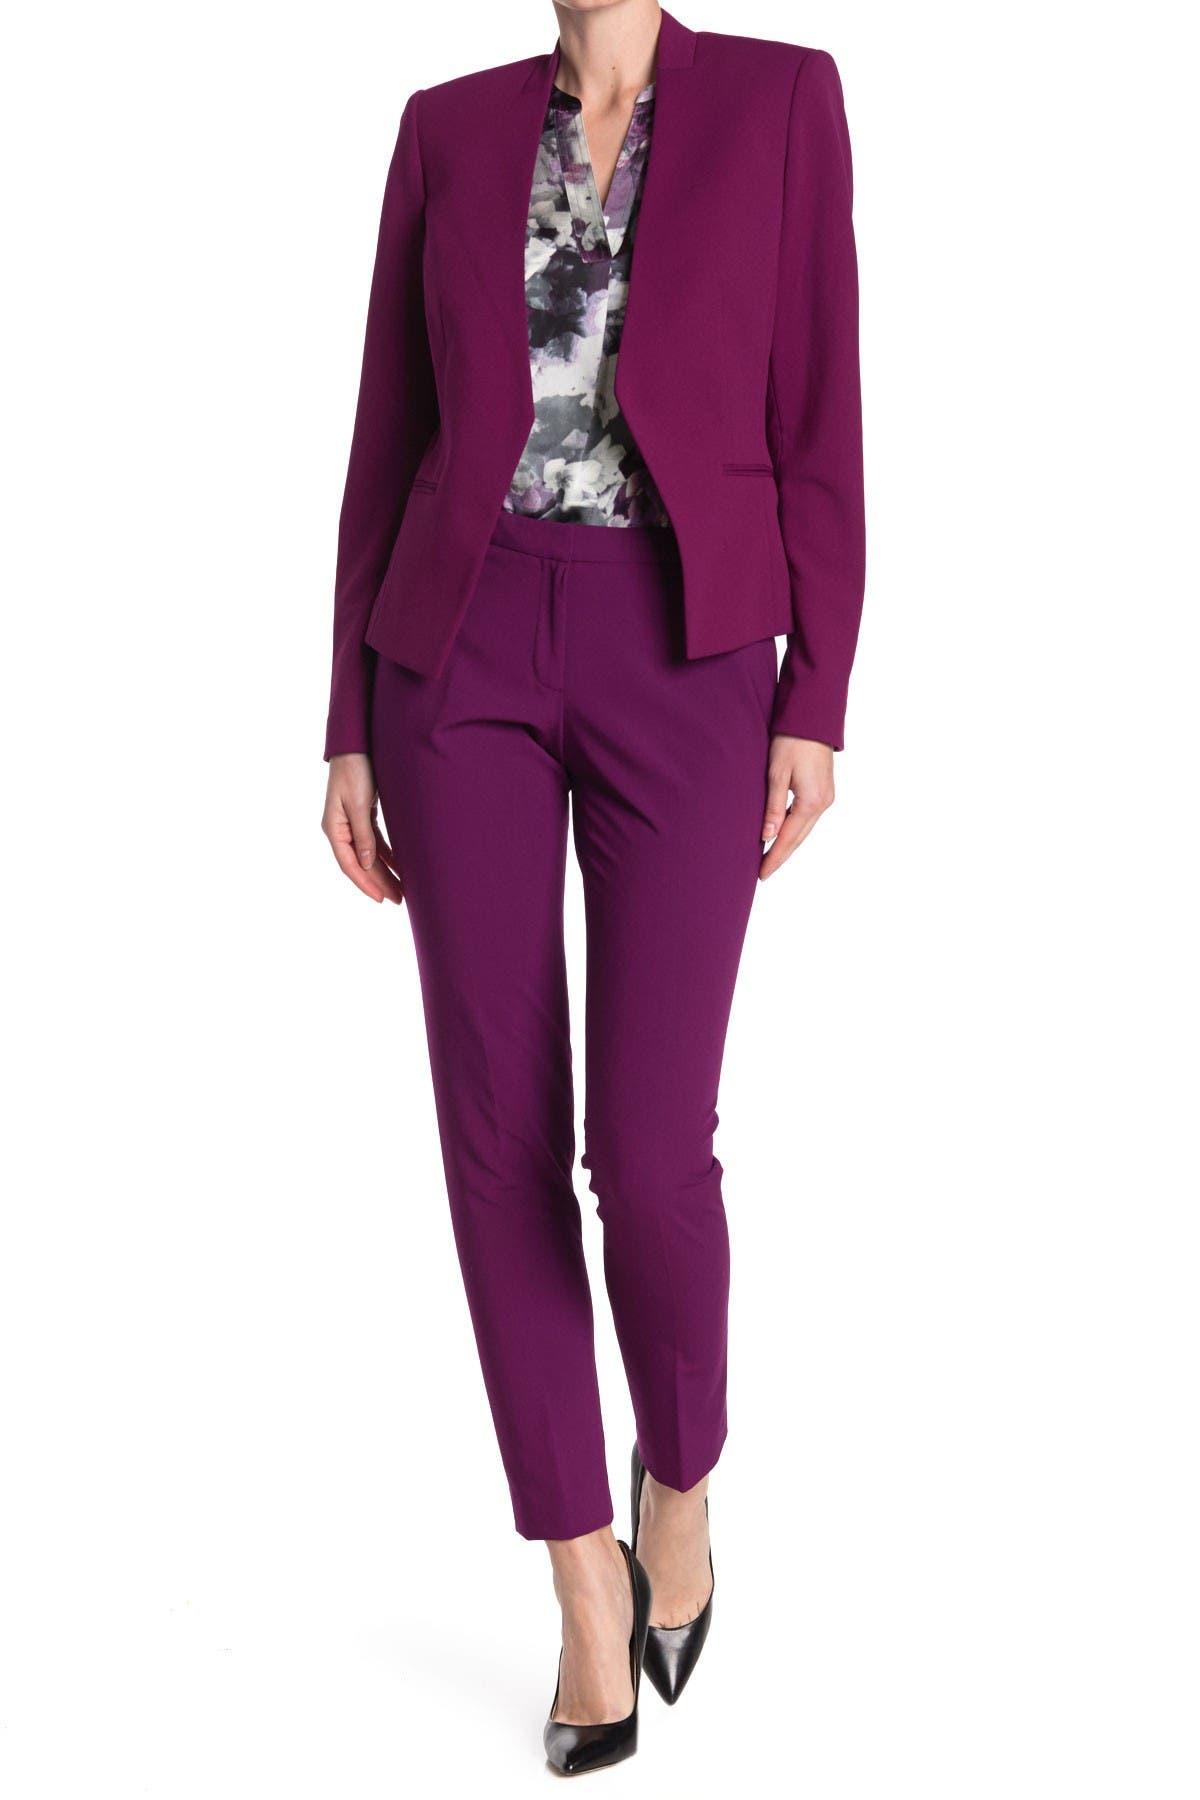 Image of Calvin Klein Mid Rise Slim Leg Pants